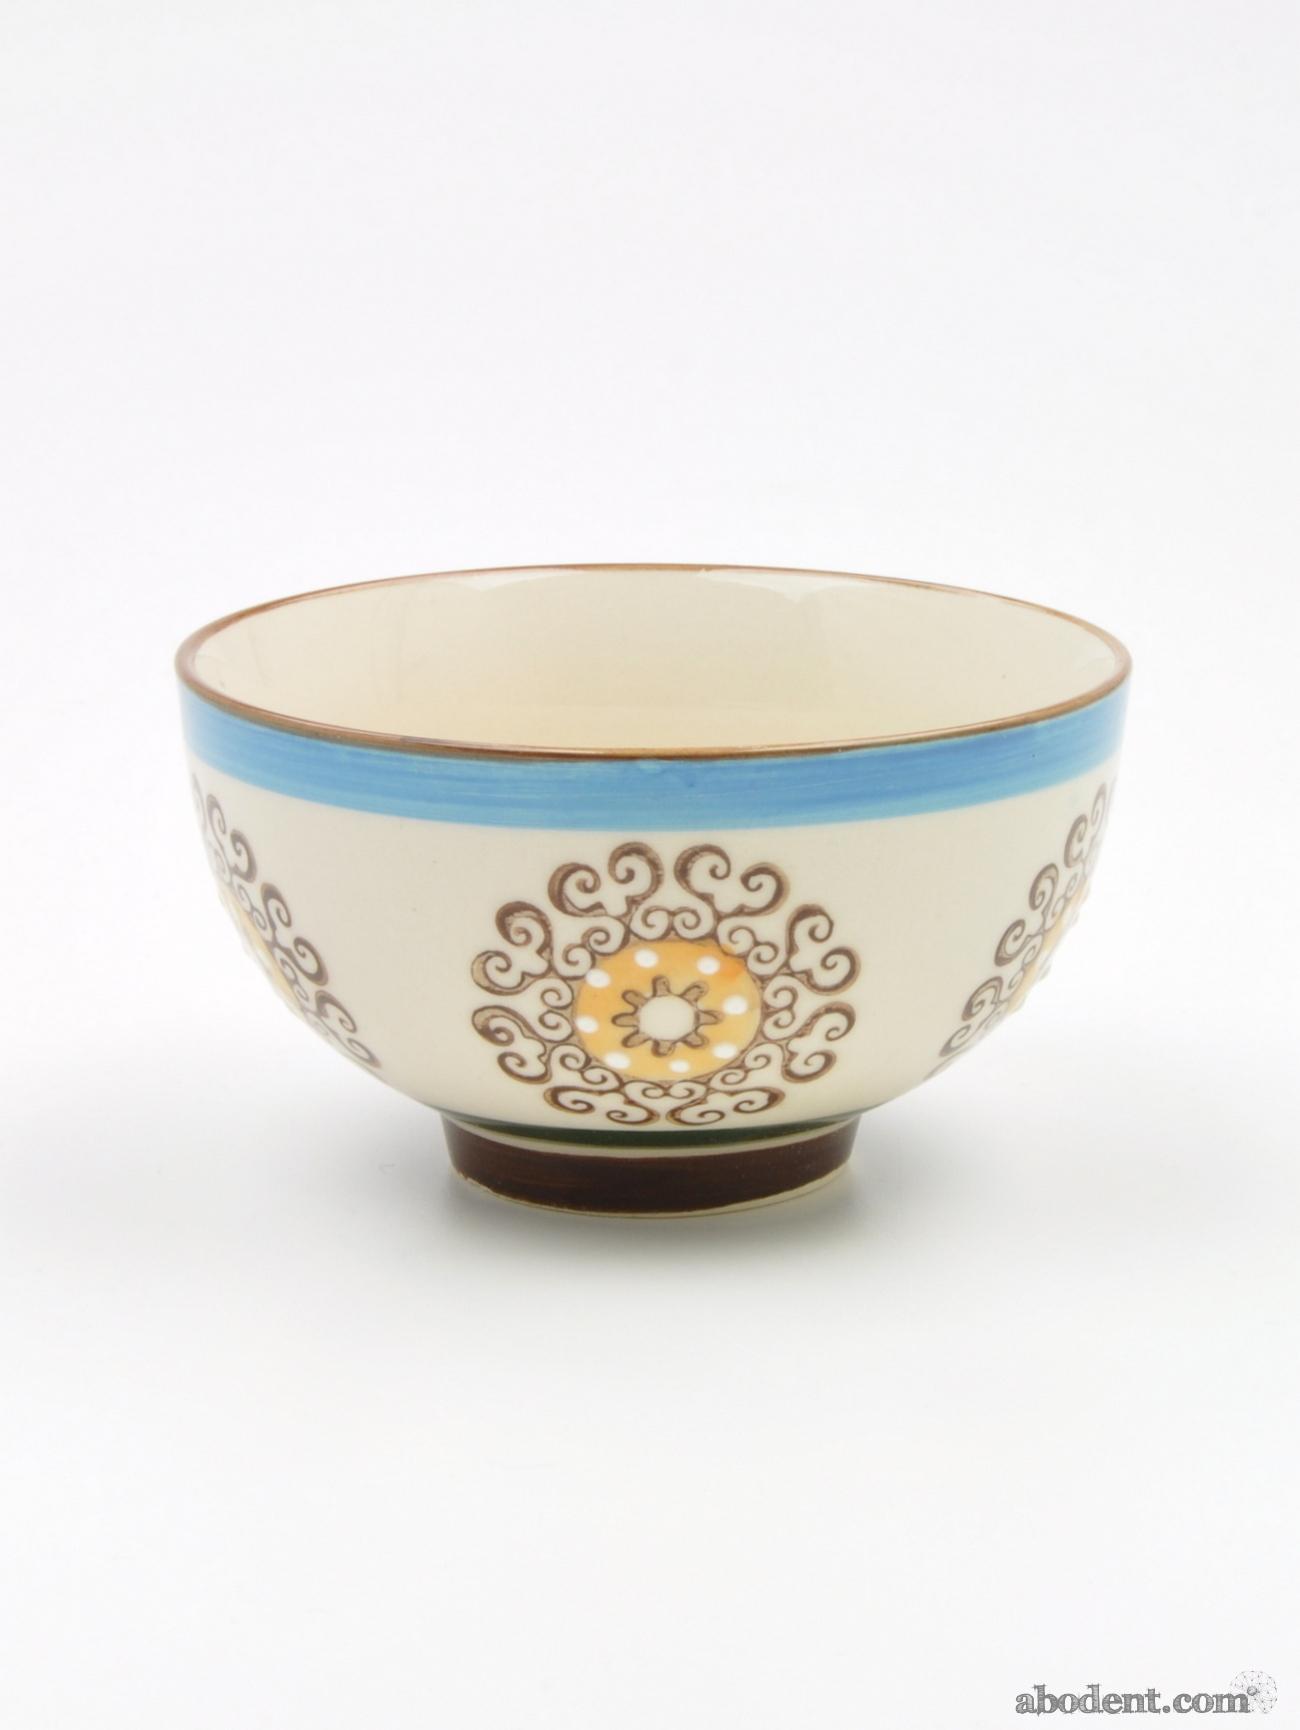 Decorative Small Painted Ceramic Decorative Bowls Sun